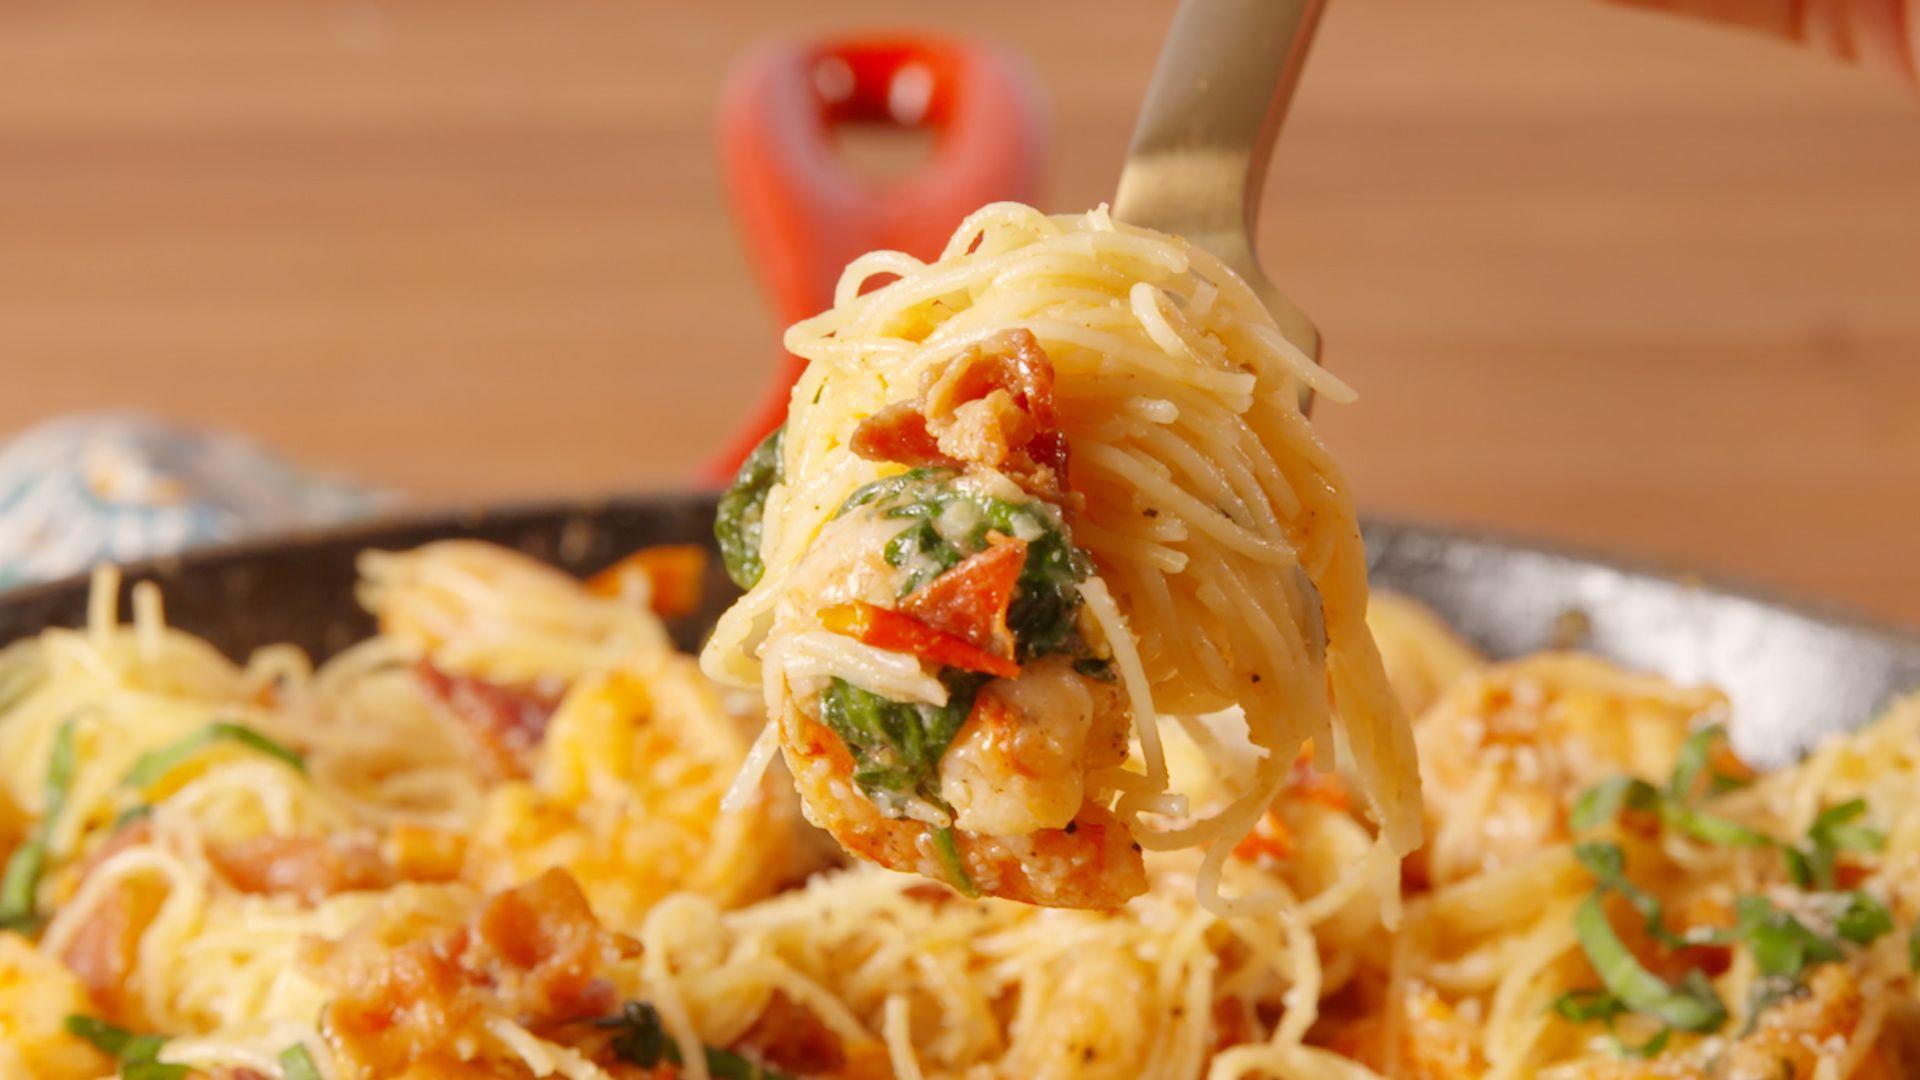 Best Bacon Shrimp Pasta Recipe How To Make Bacon Shrimp Pasta